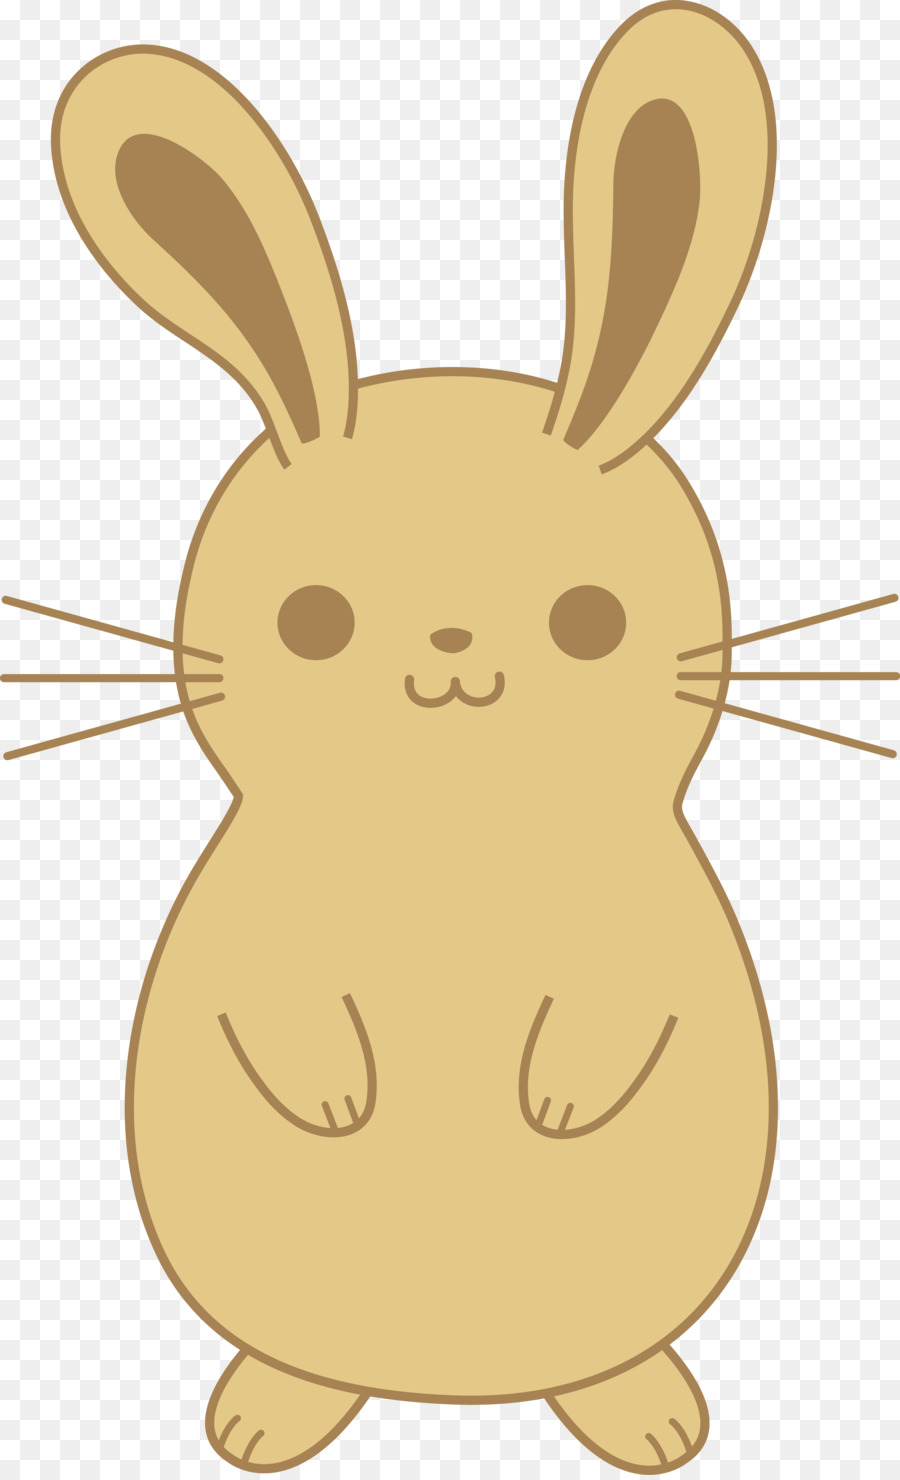 900x1480 Easter Bunny Rabbit Cuteness Drawing Clip Art